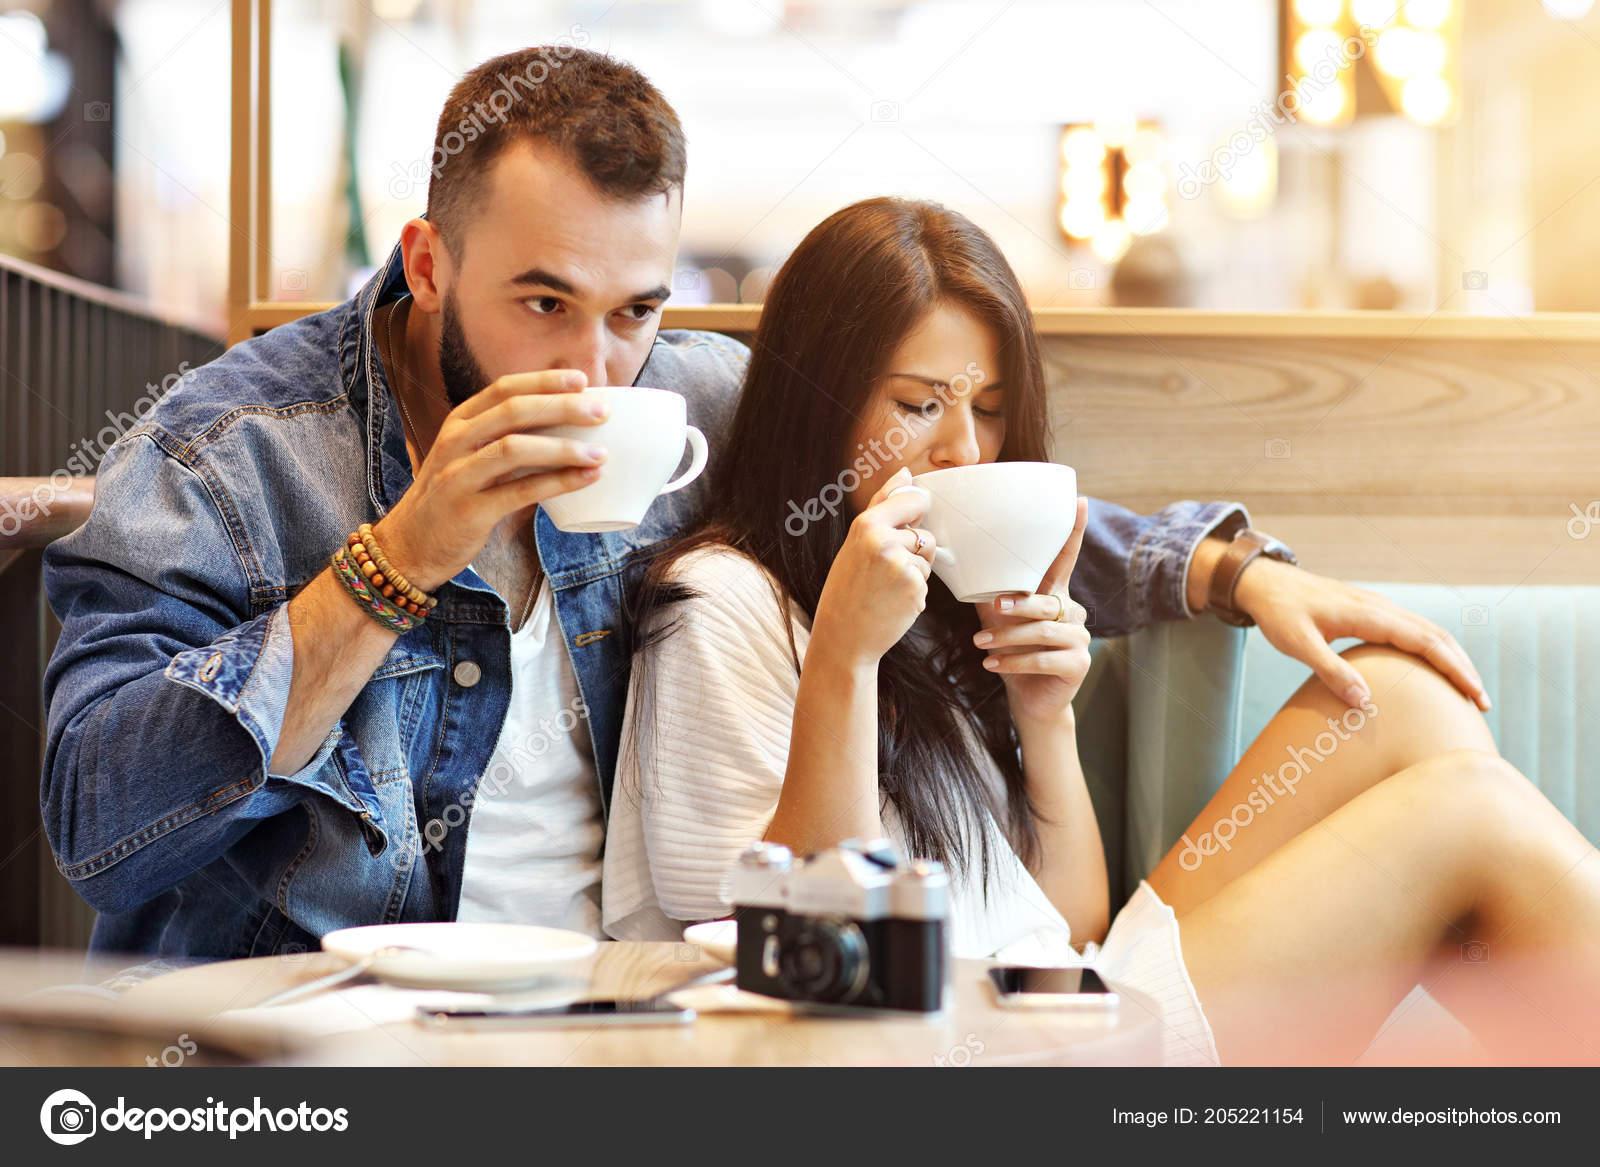 Dating Cafe Mainz – 19 Alternativen zu datingcafe